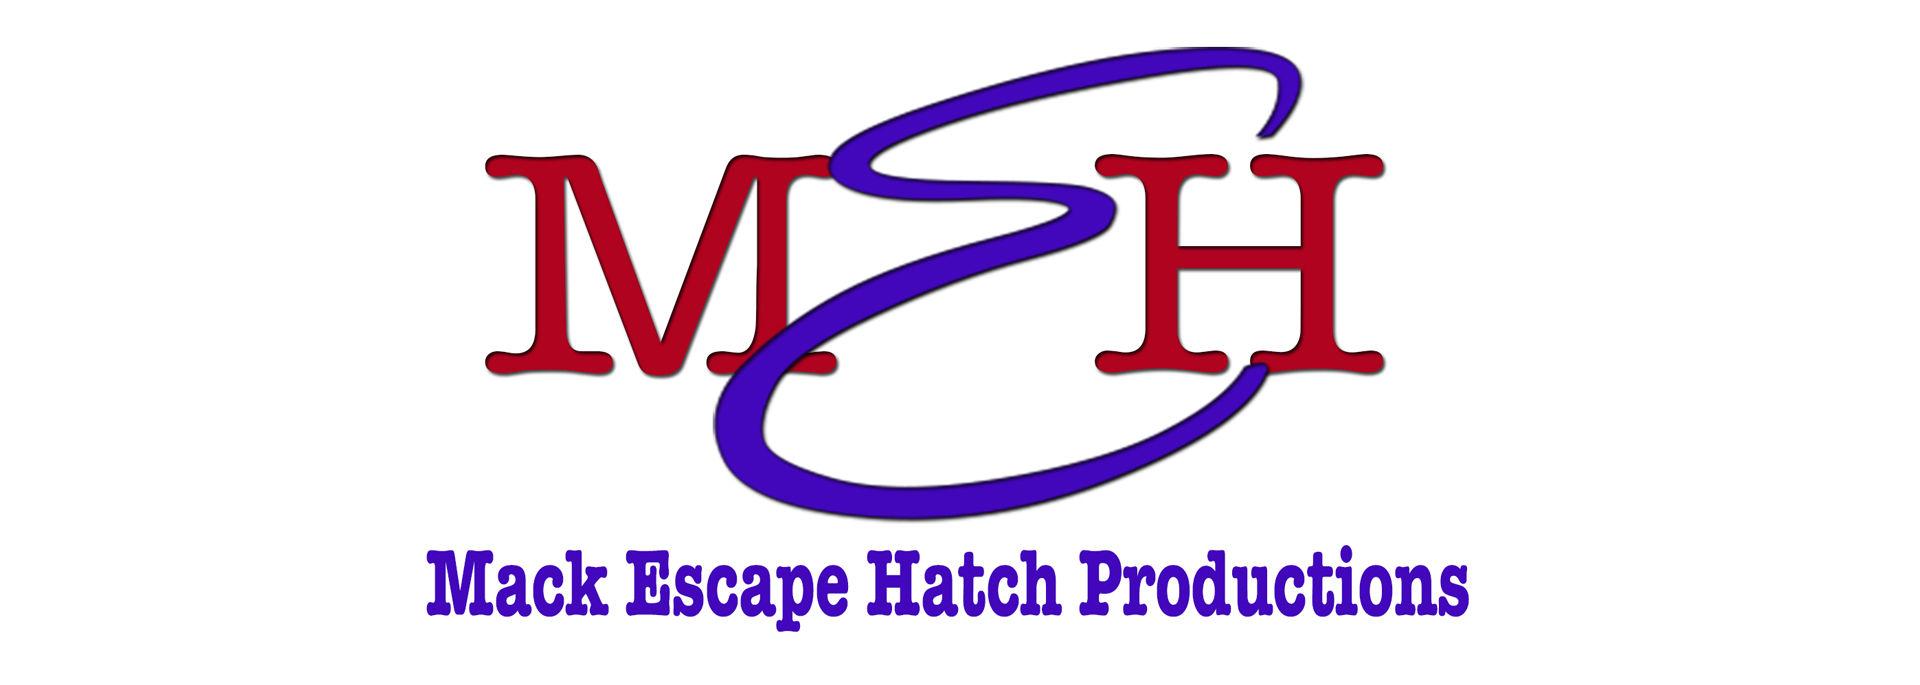 MEH Network channel